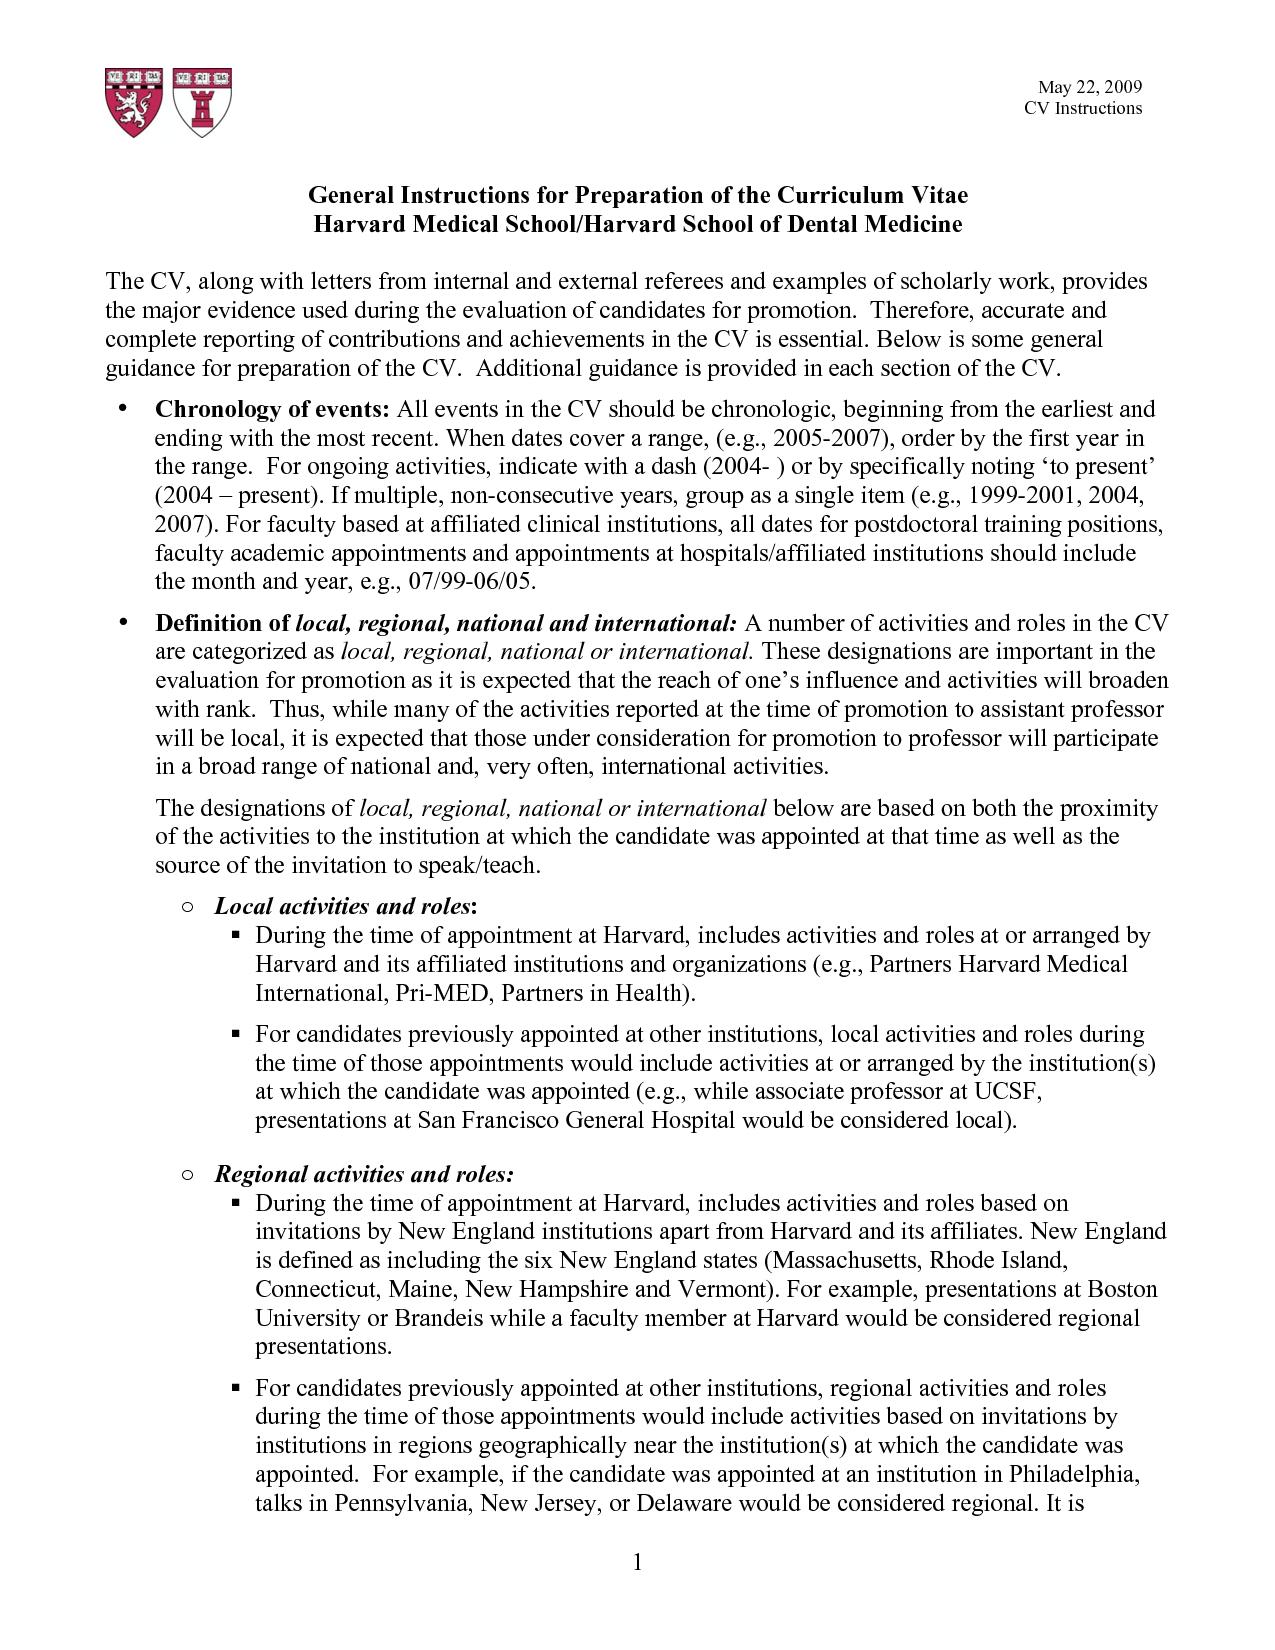 Harvard Resume Template 2015 Resume examples